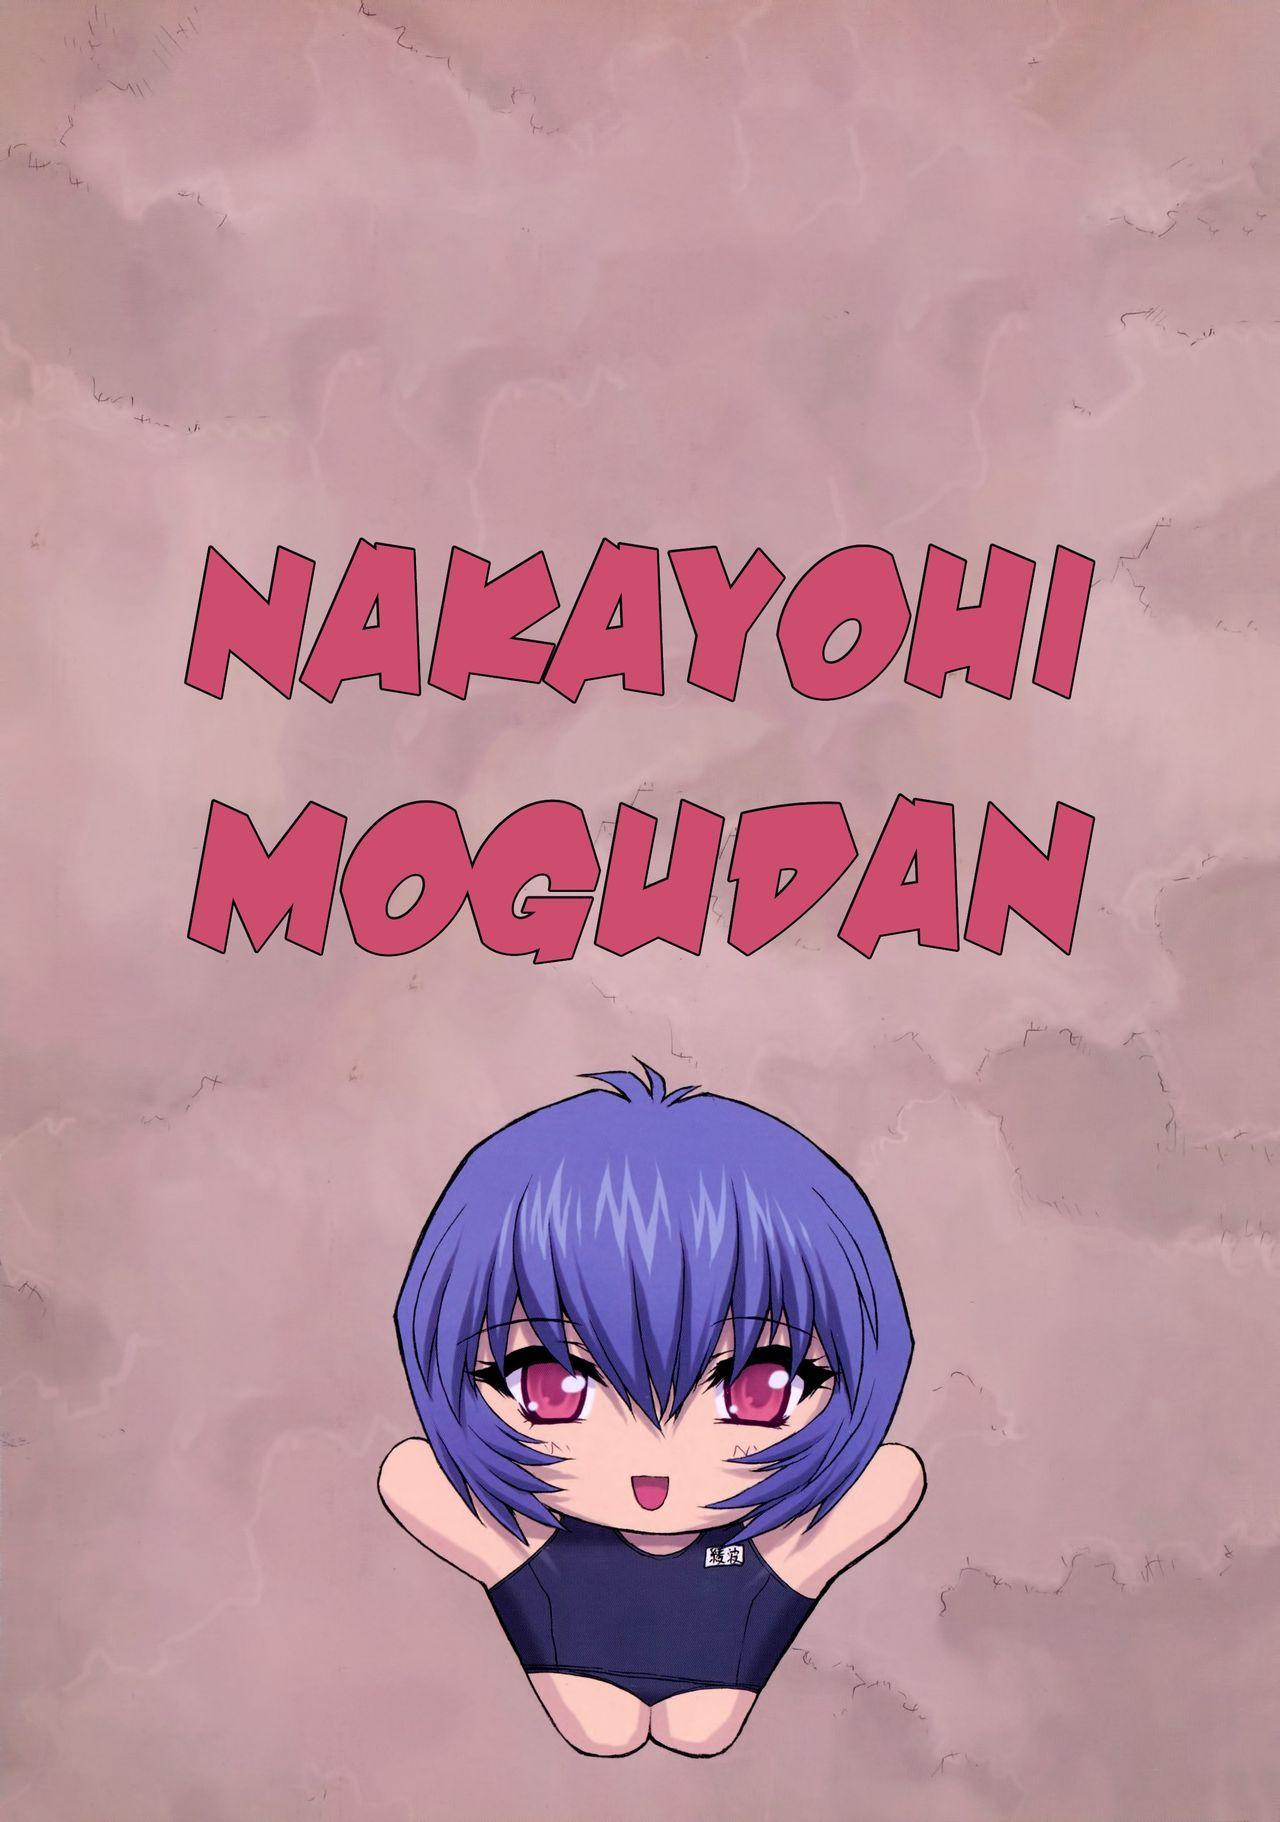 Ayanami 3 Sensei Hen   Ayanami 3 Teacher Edition 2